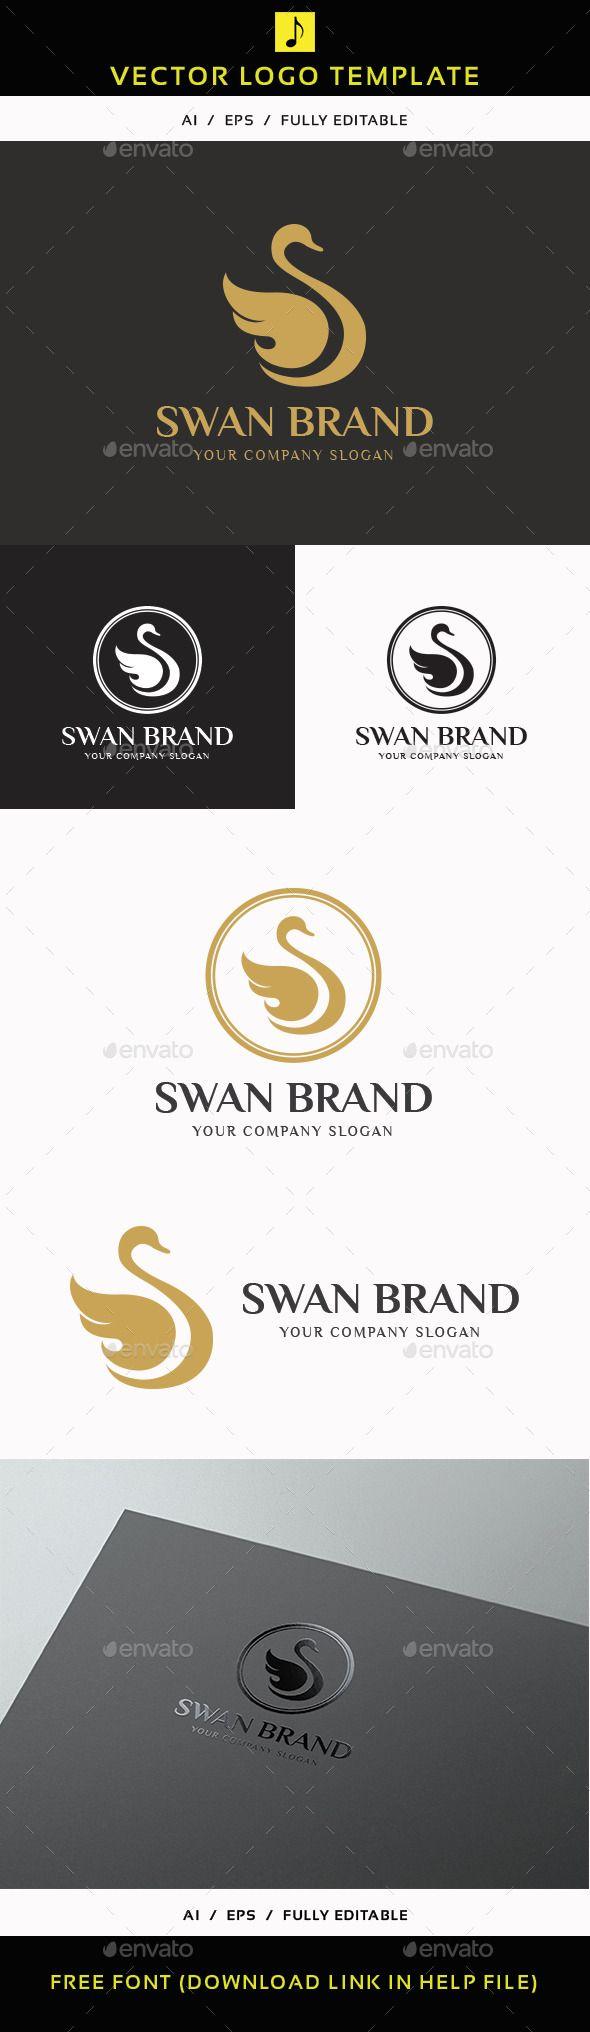 Swan Brand Logo Design Template Vector logotype